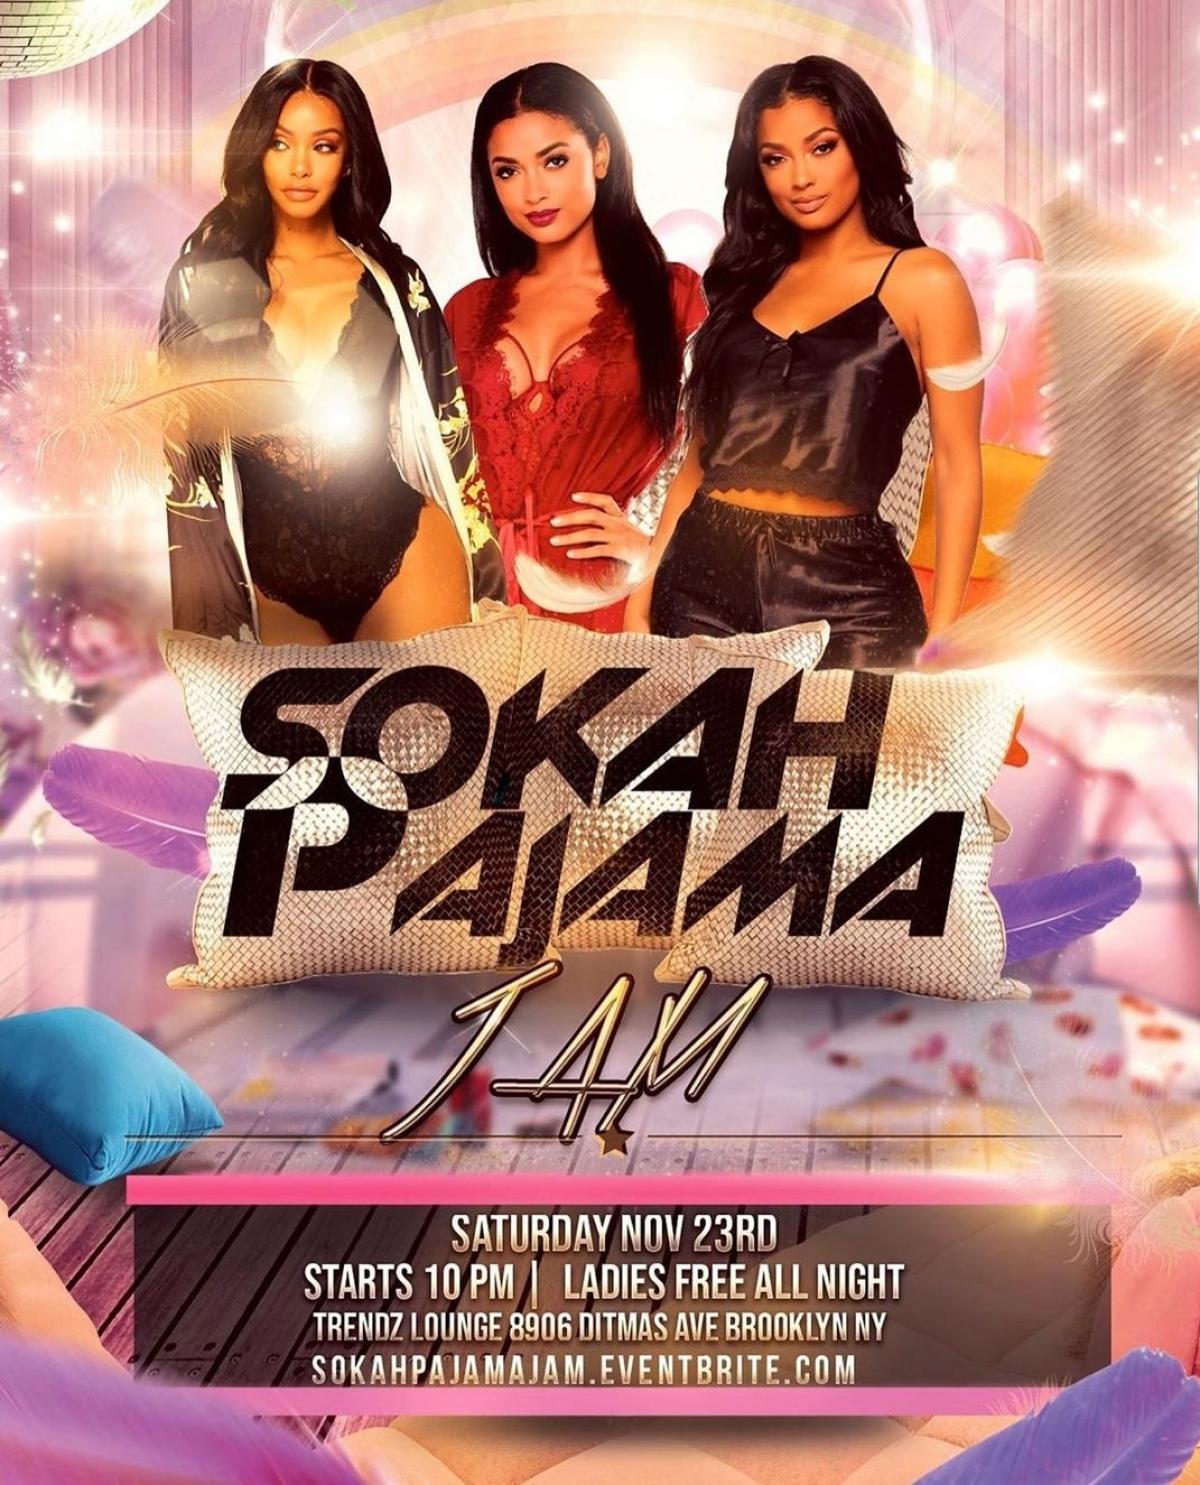 Sokah Pajama Jam flyer or graphic.